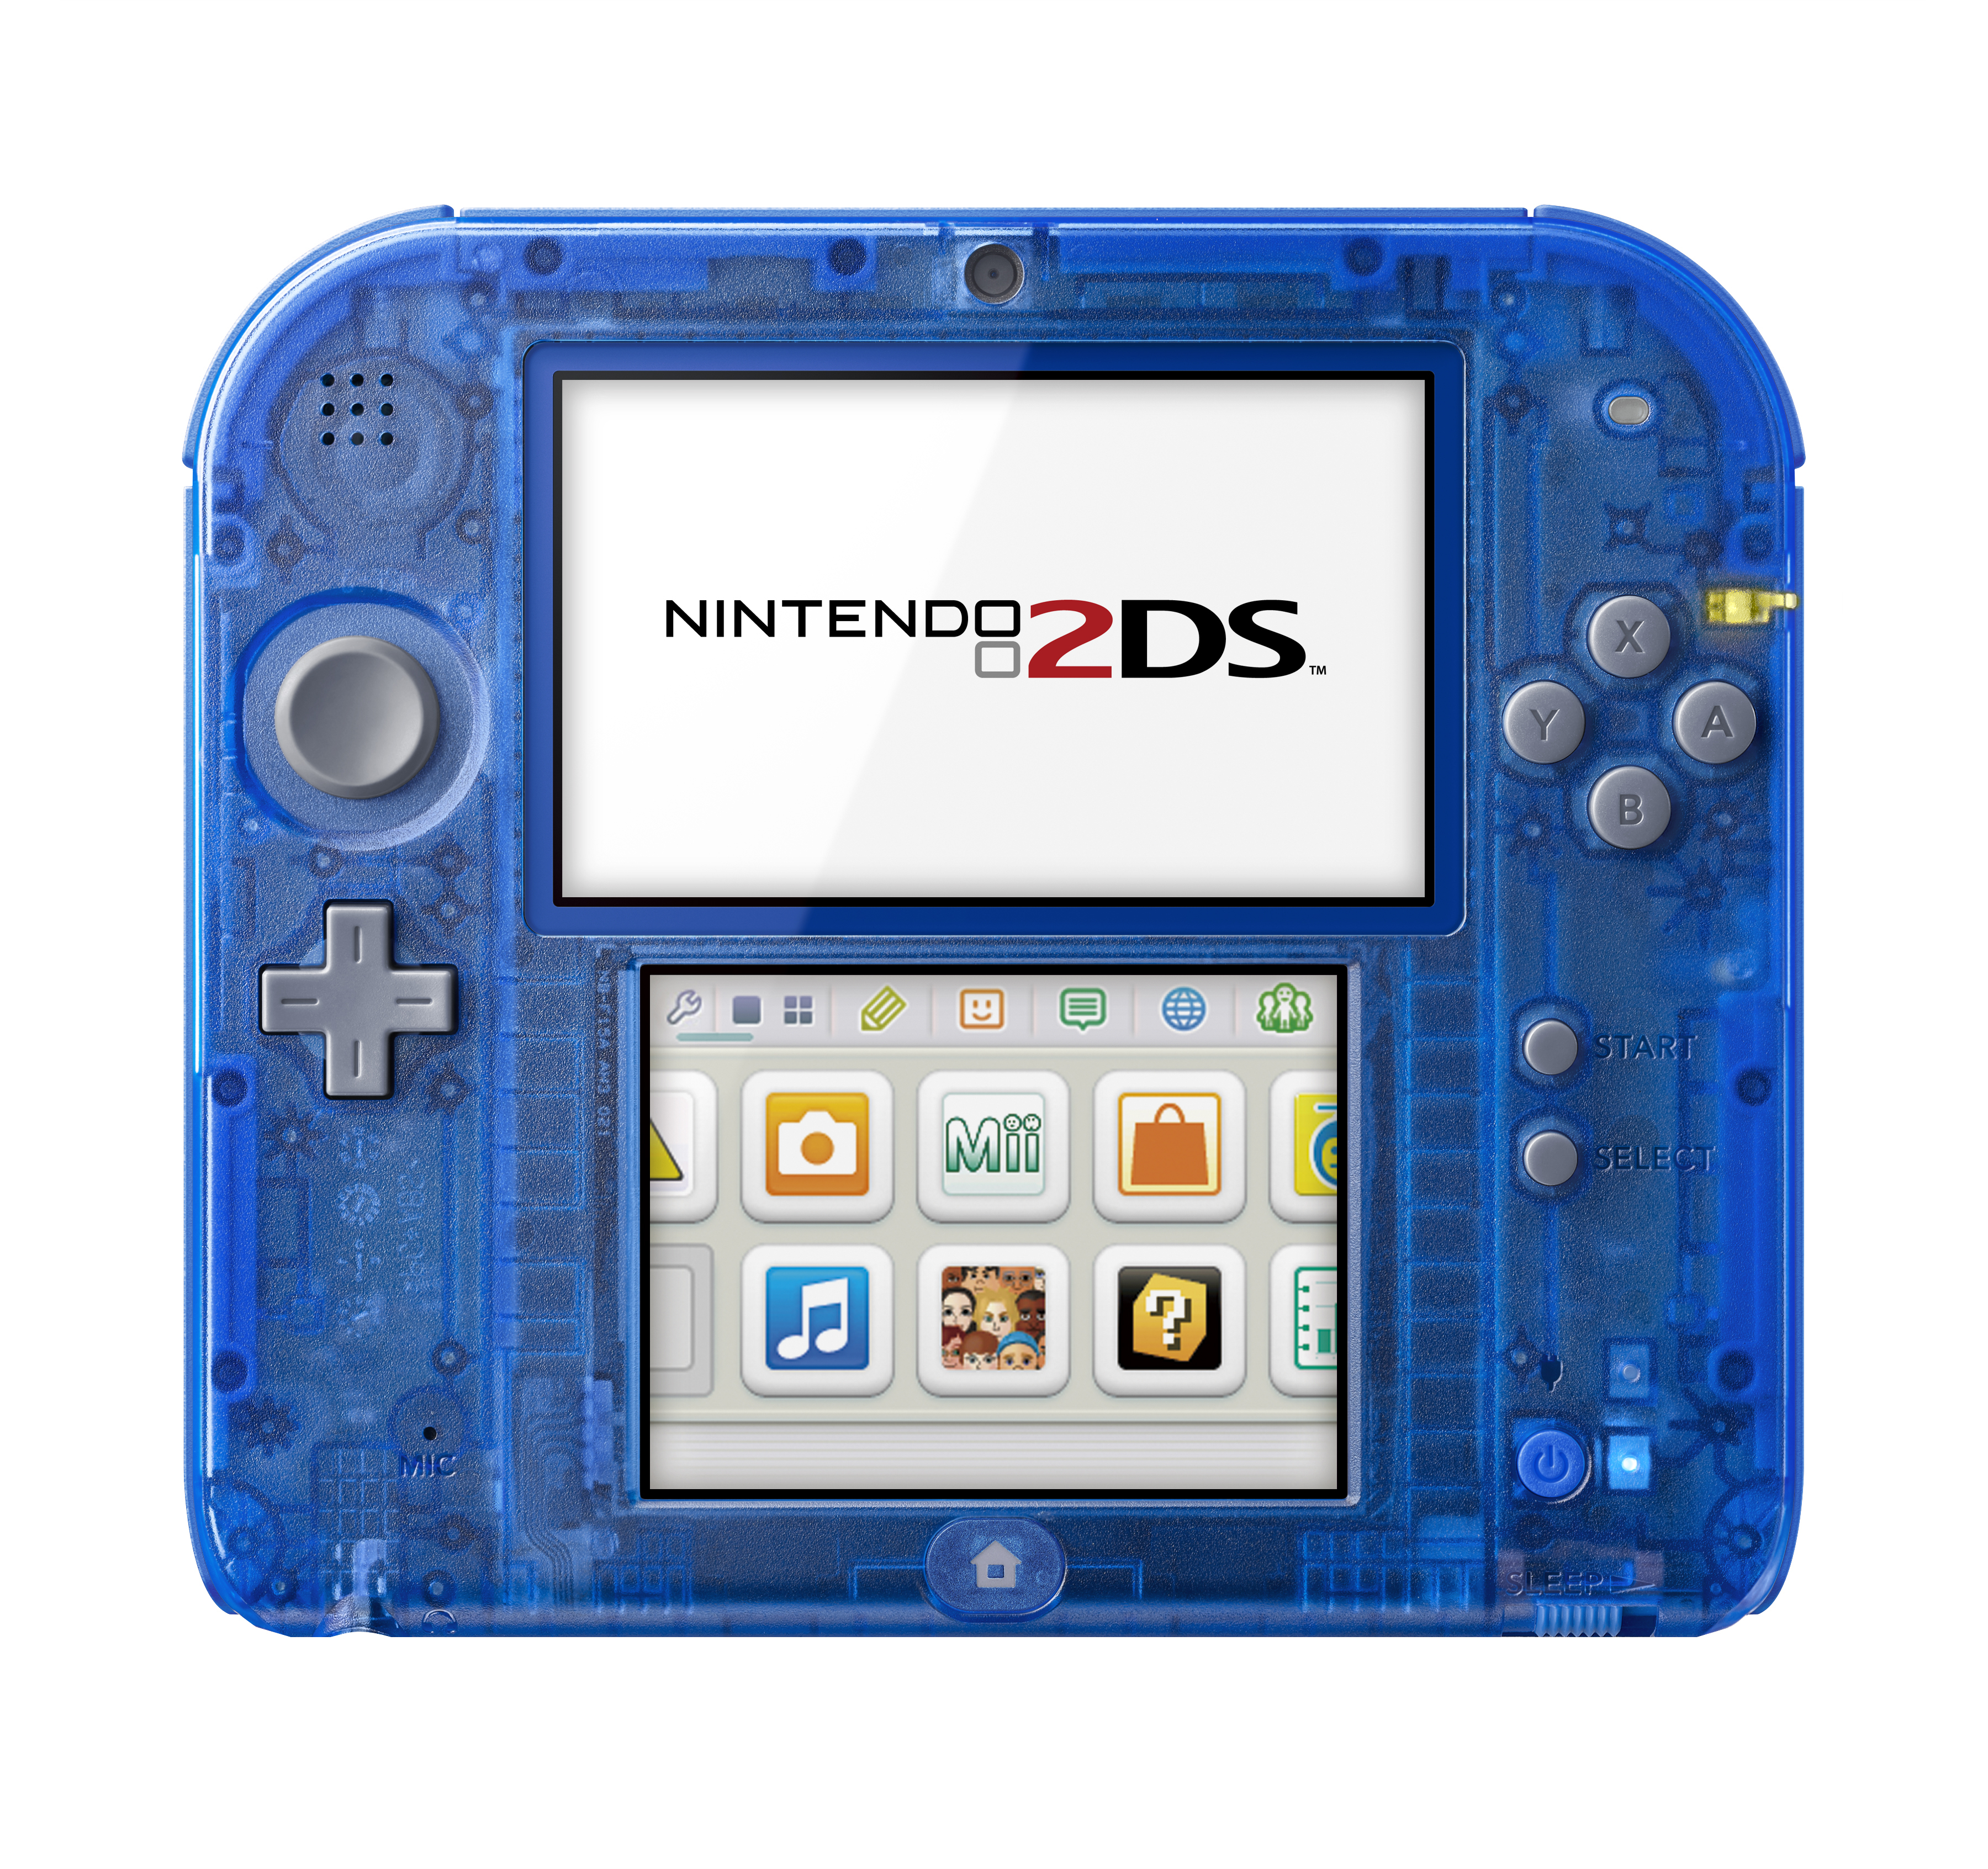 Nintendo News: The Choice This Holiday Season is Crystal Clear